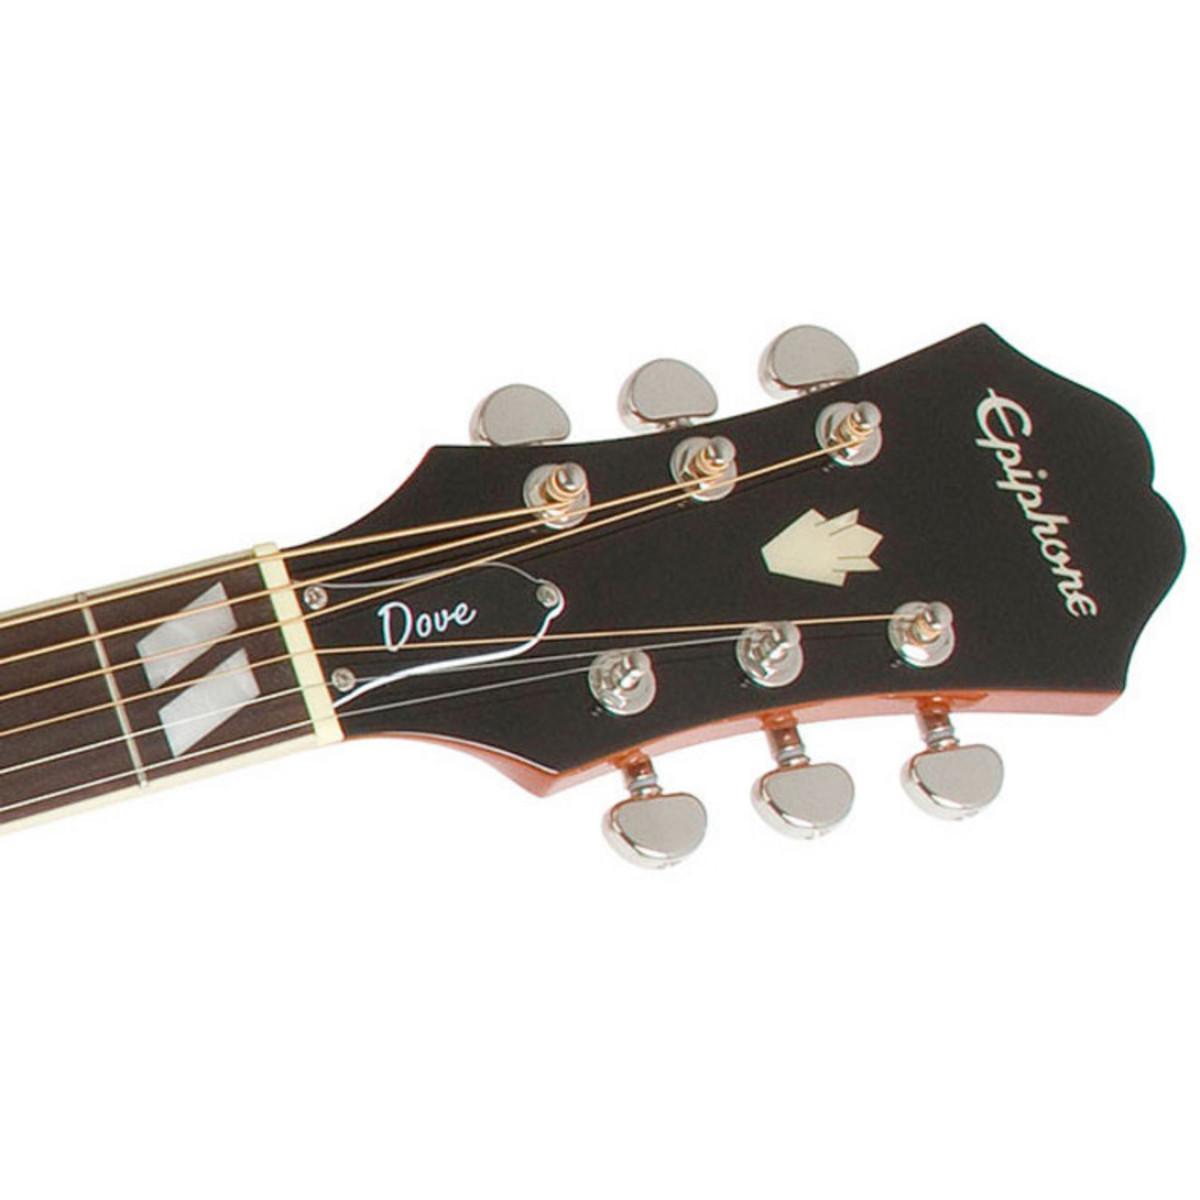 epiphone colombe pro guitare electro acoustique bo te. Black Bedroom Furniture Sets. Home Design Ideas